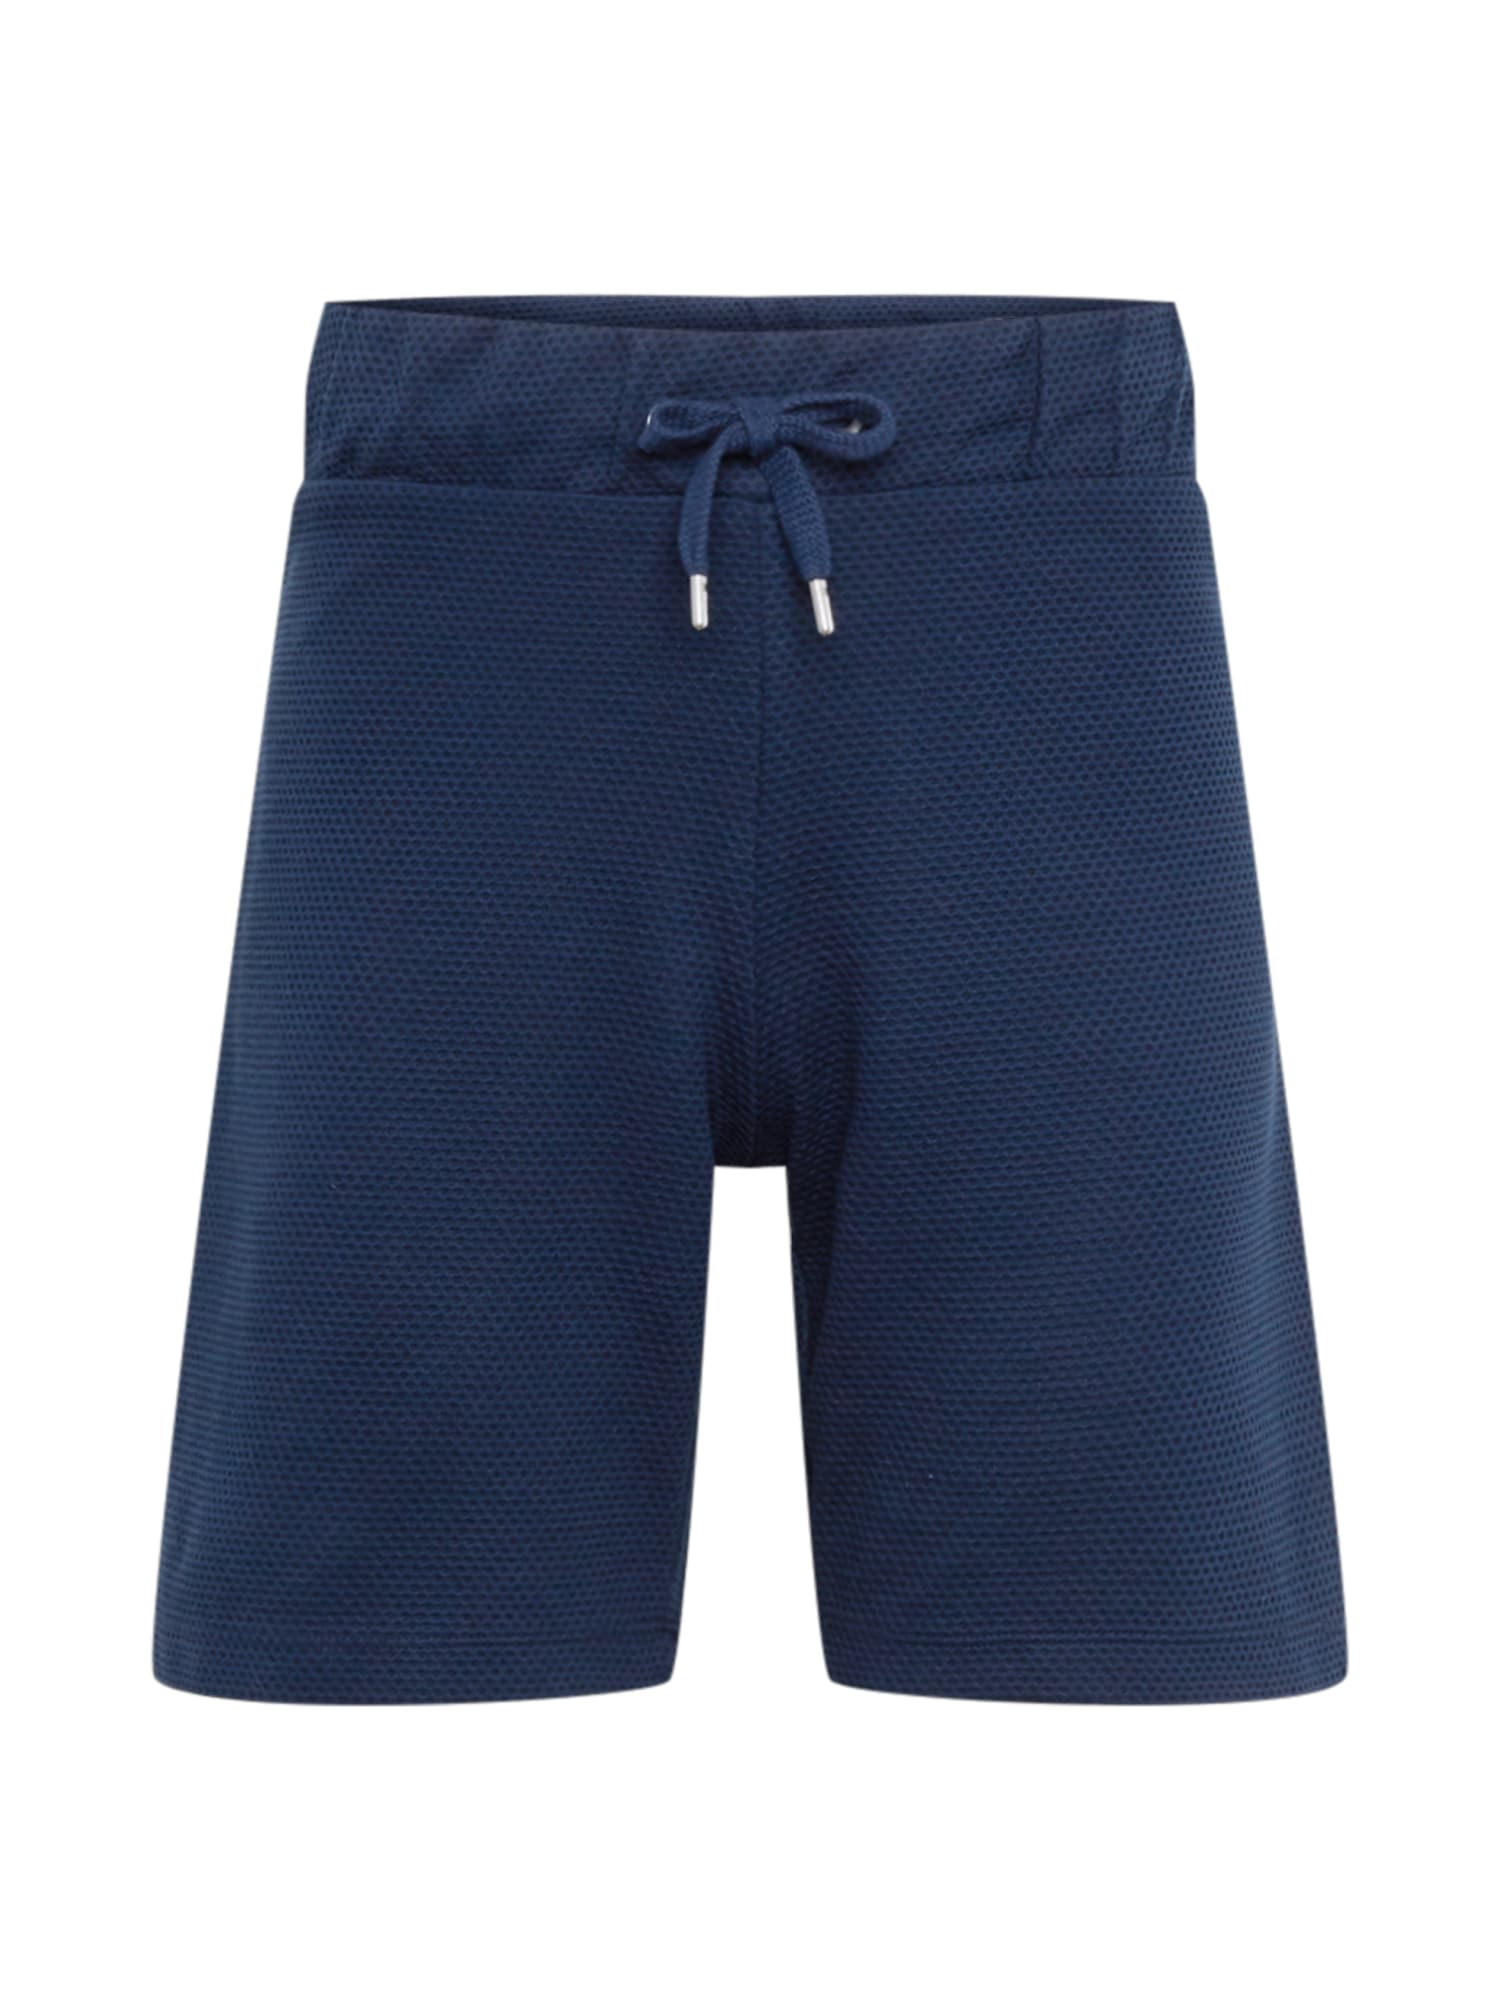 JACK & JONES Kelnės 'FRANCO' tamsiai mėlyna